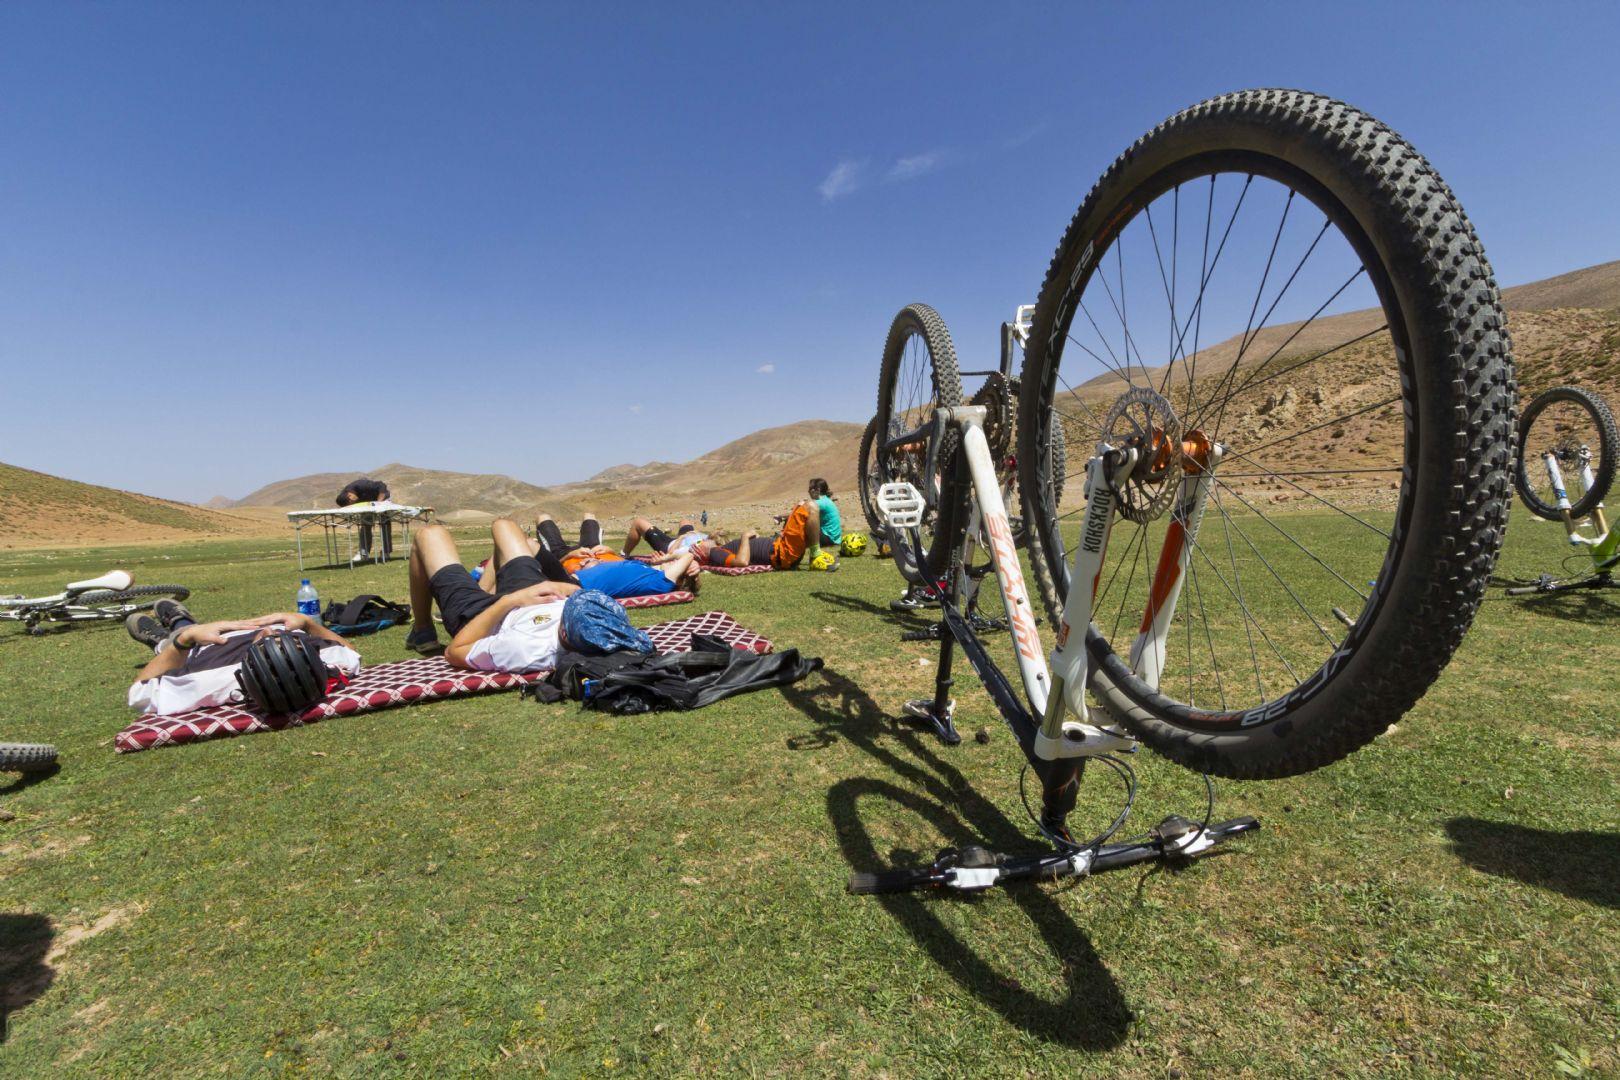 _Customer_104484_20762.jpg - Morocco - High Atlas Traverse - Guided Mountain Bike Holiday - Mountain Biking